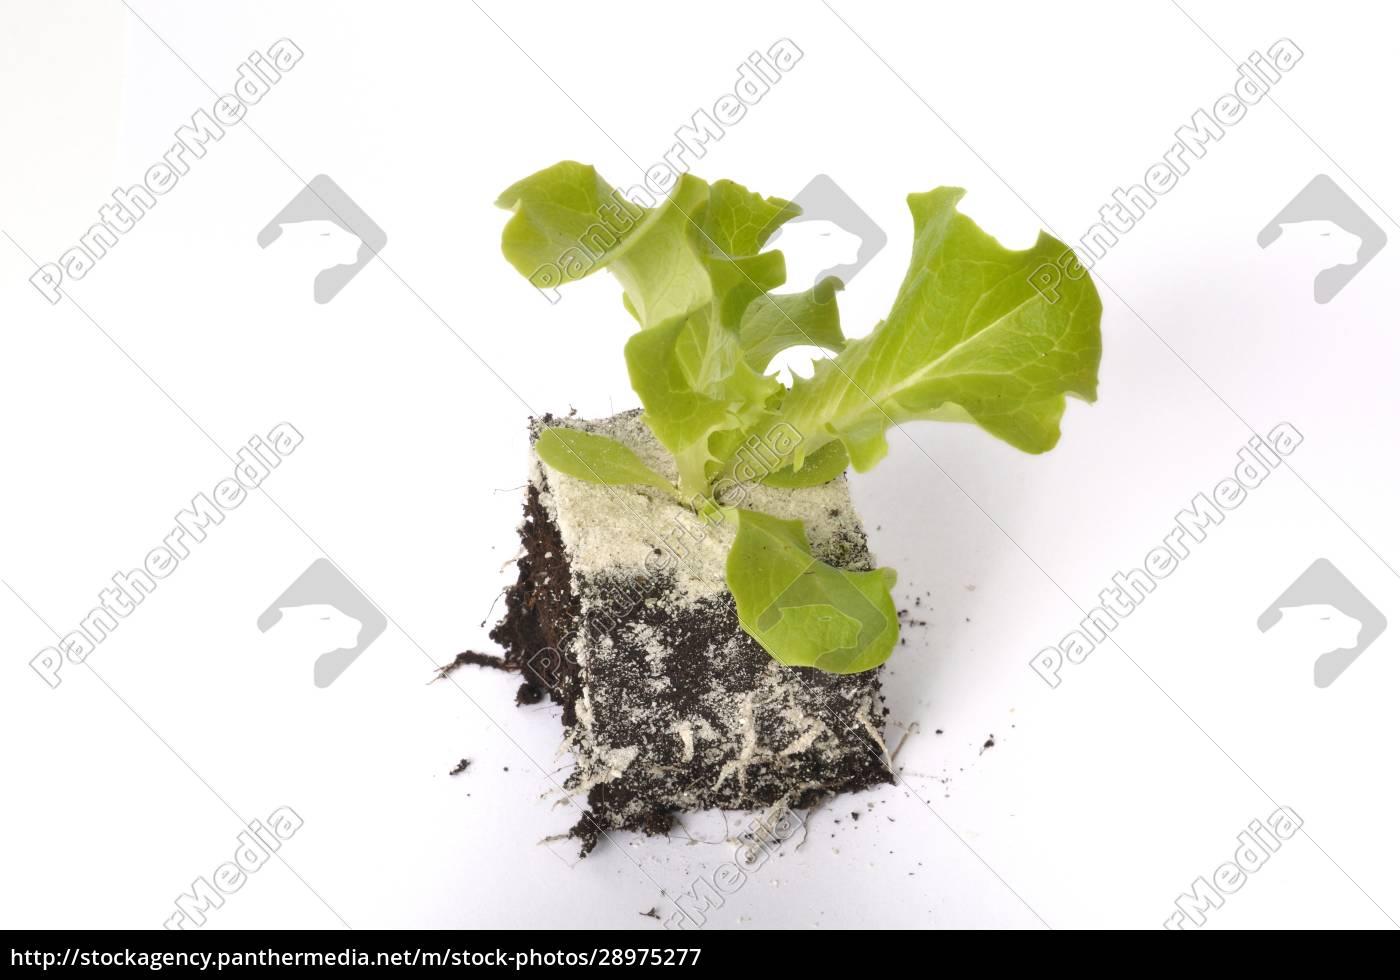 batavia, salatpflanzen - 28975277